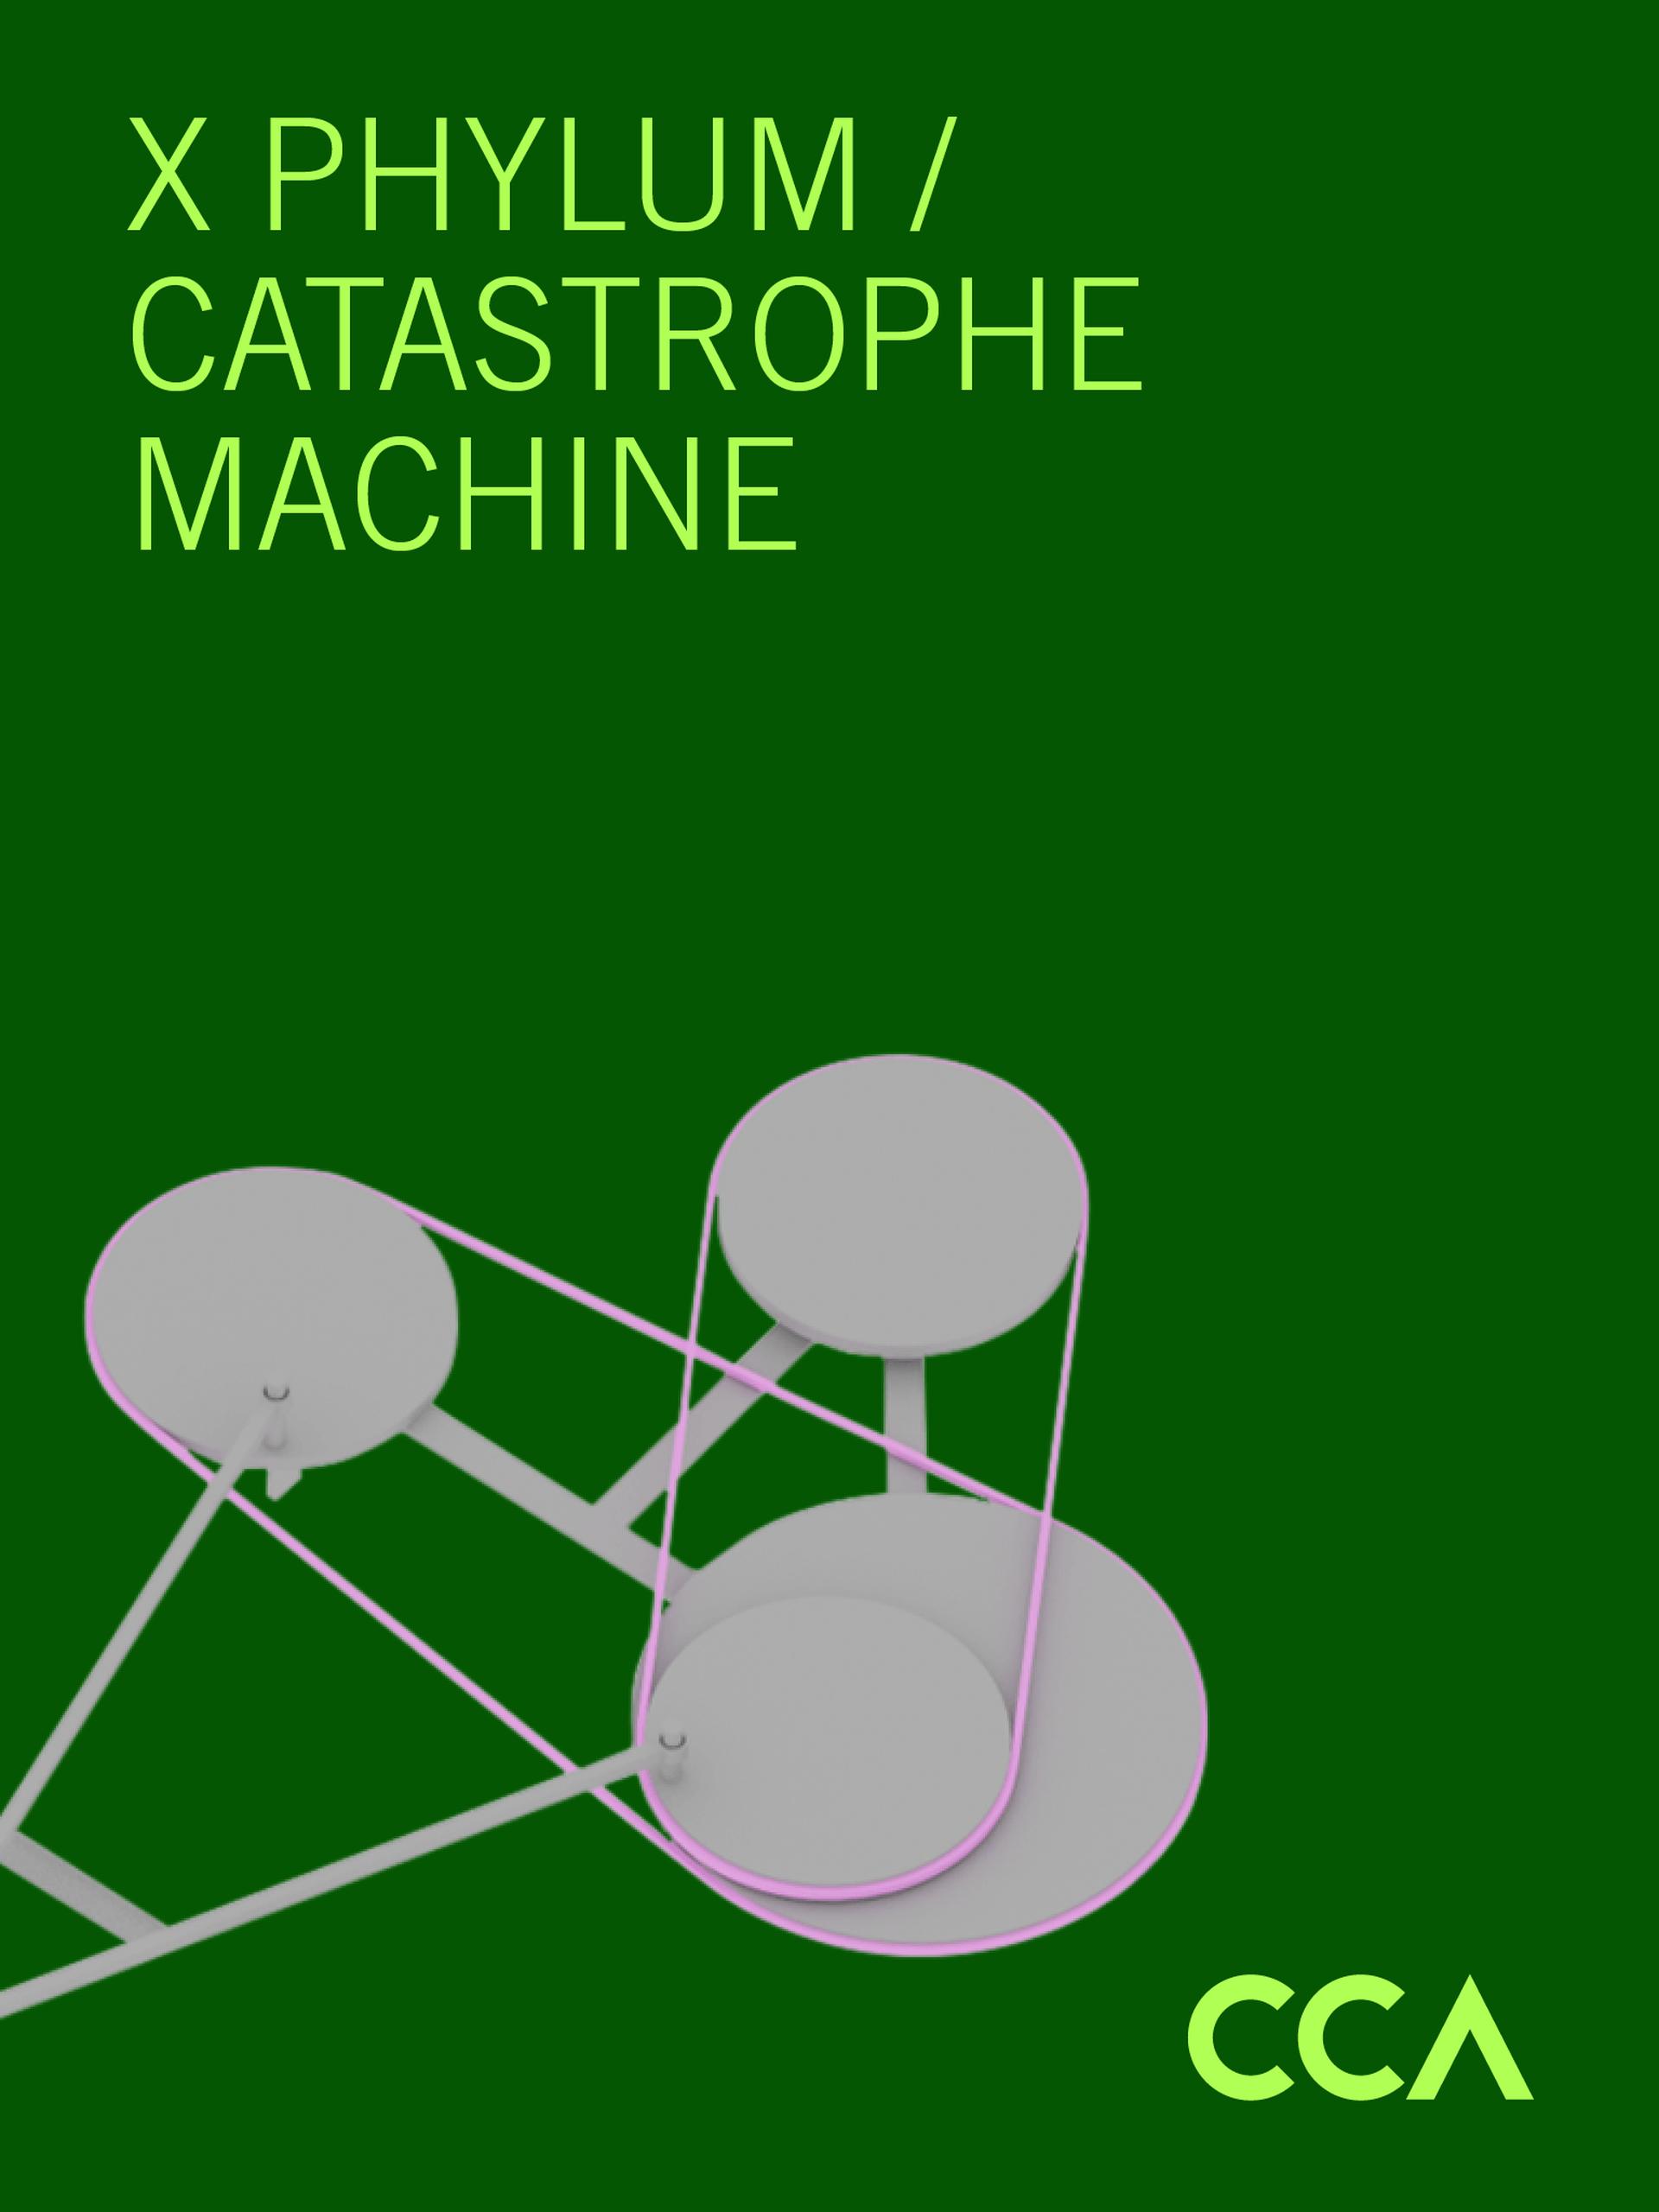 X Phylum Catastrophe Machine